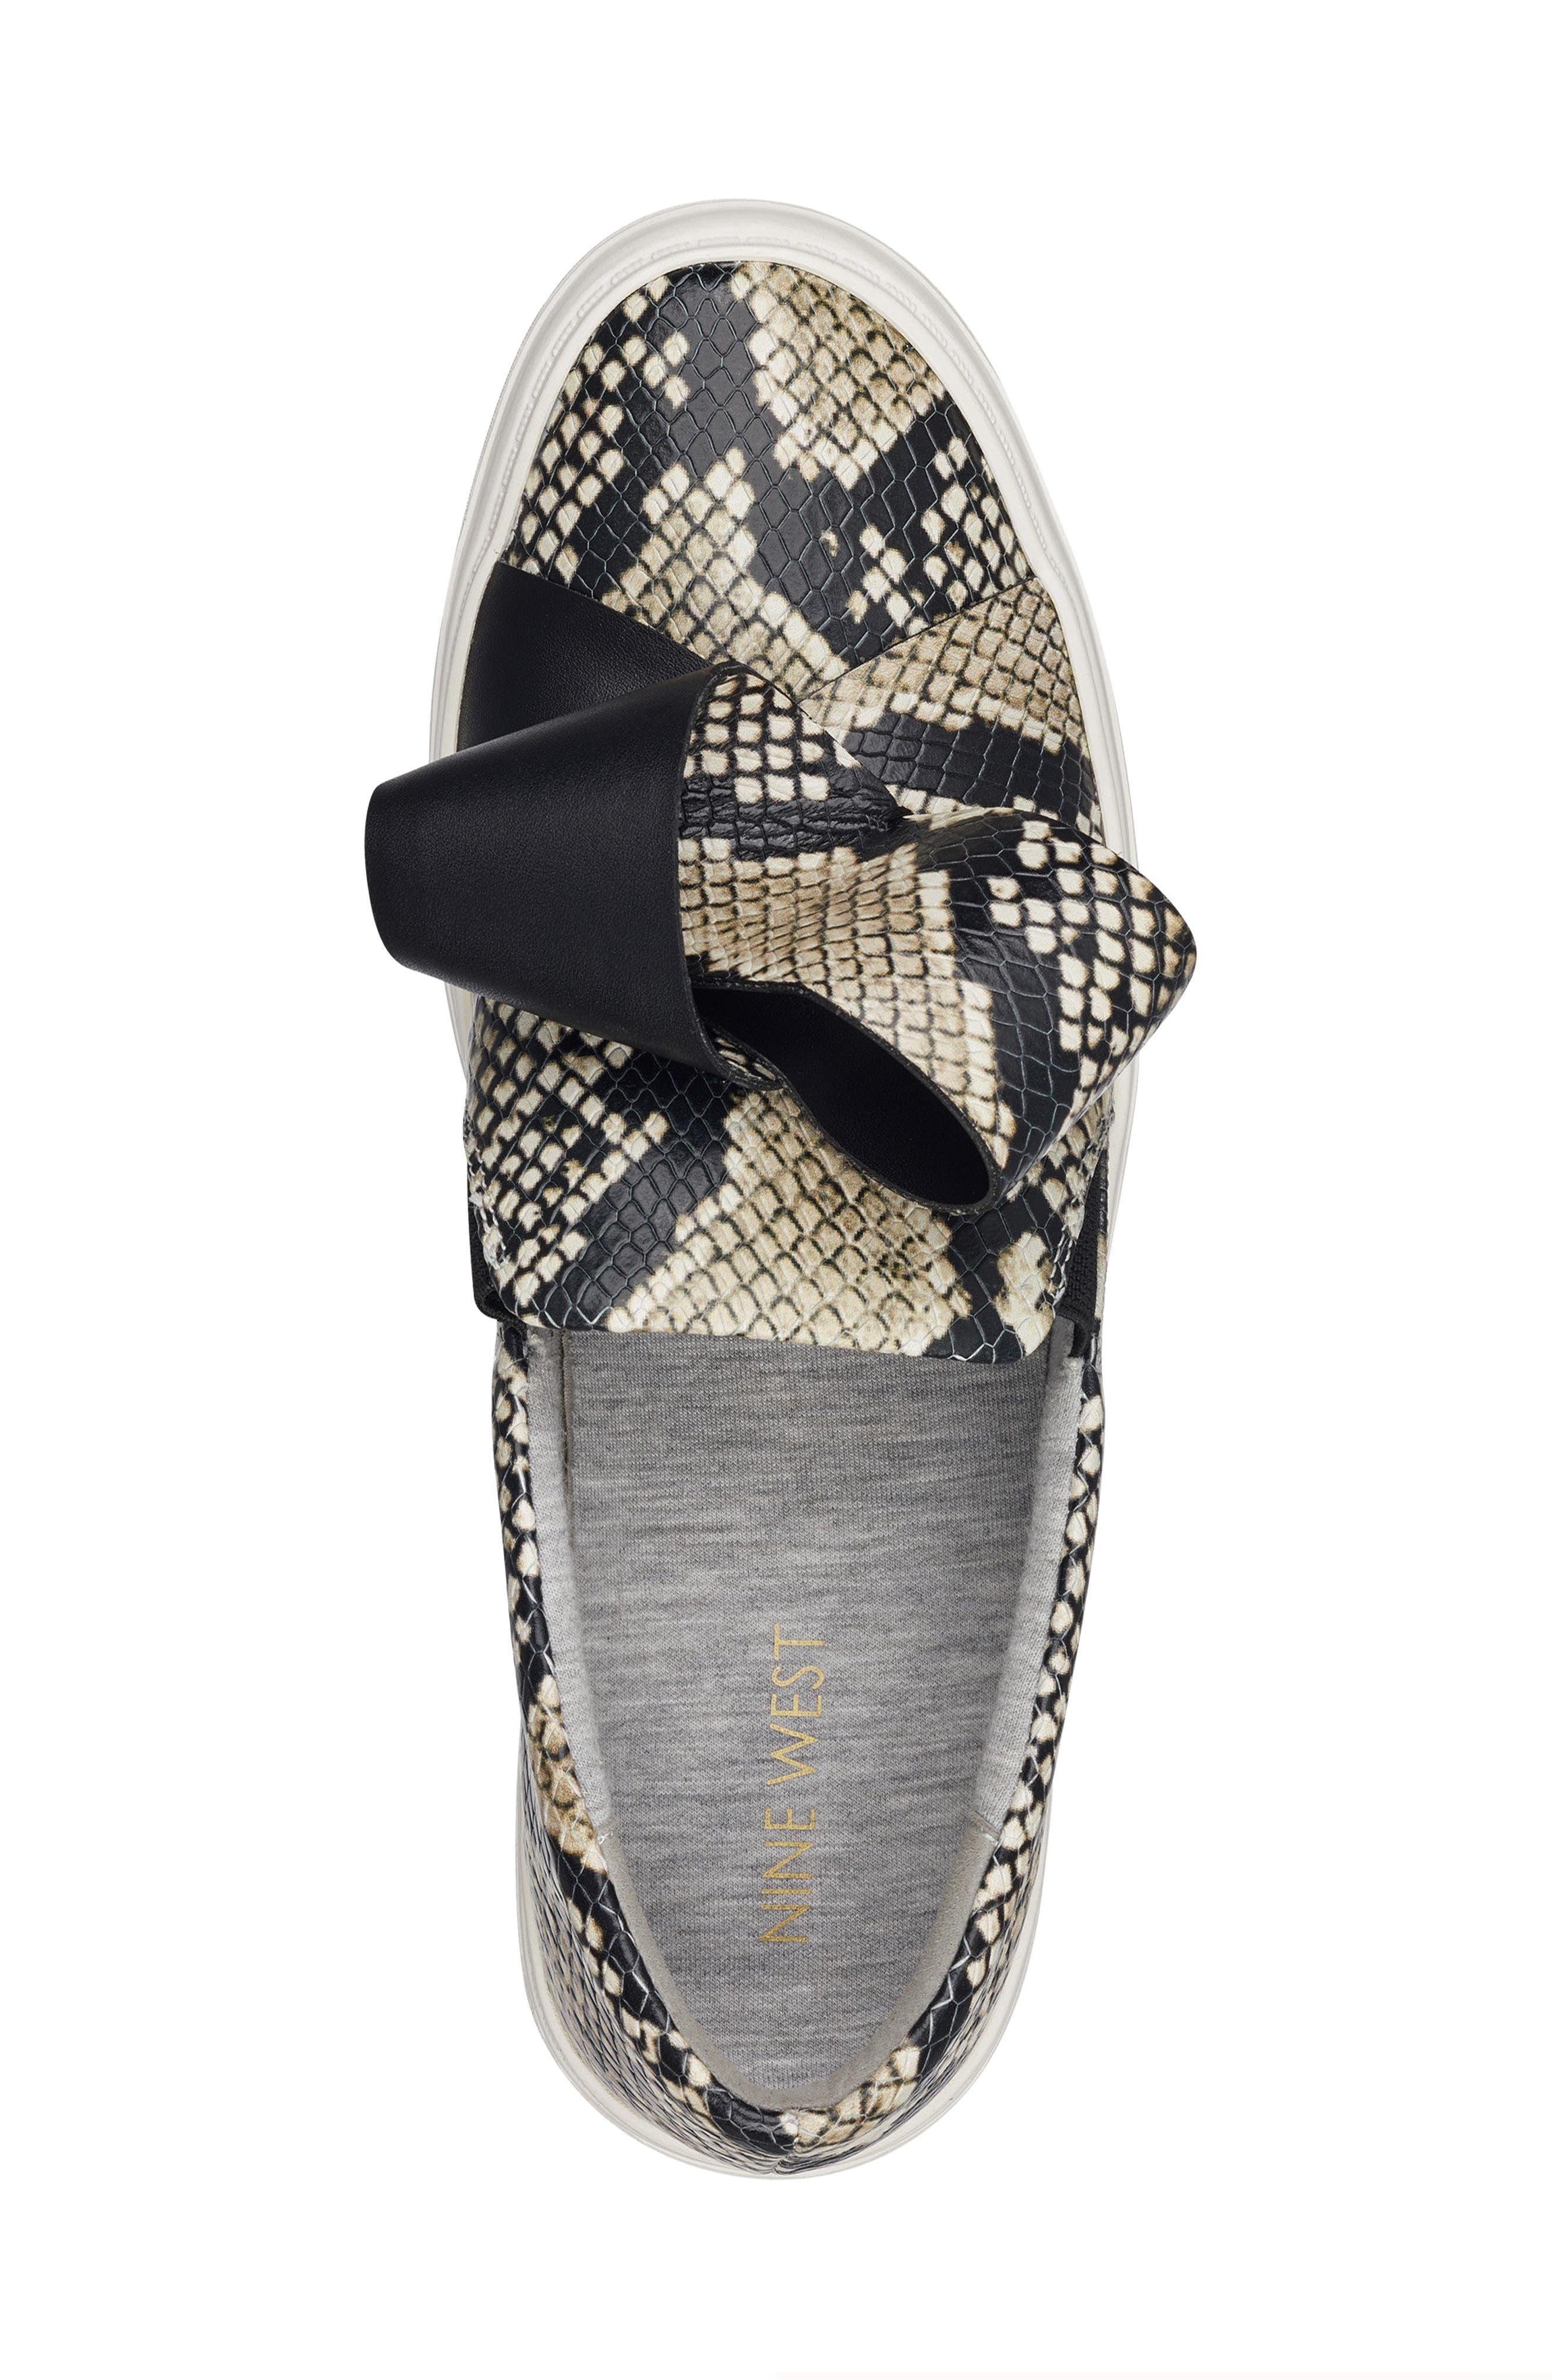 Odienella Slip-On Sneaker,                             Alternate thumbnail 5, color,                             Off White Multi Leather